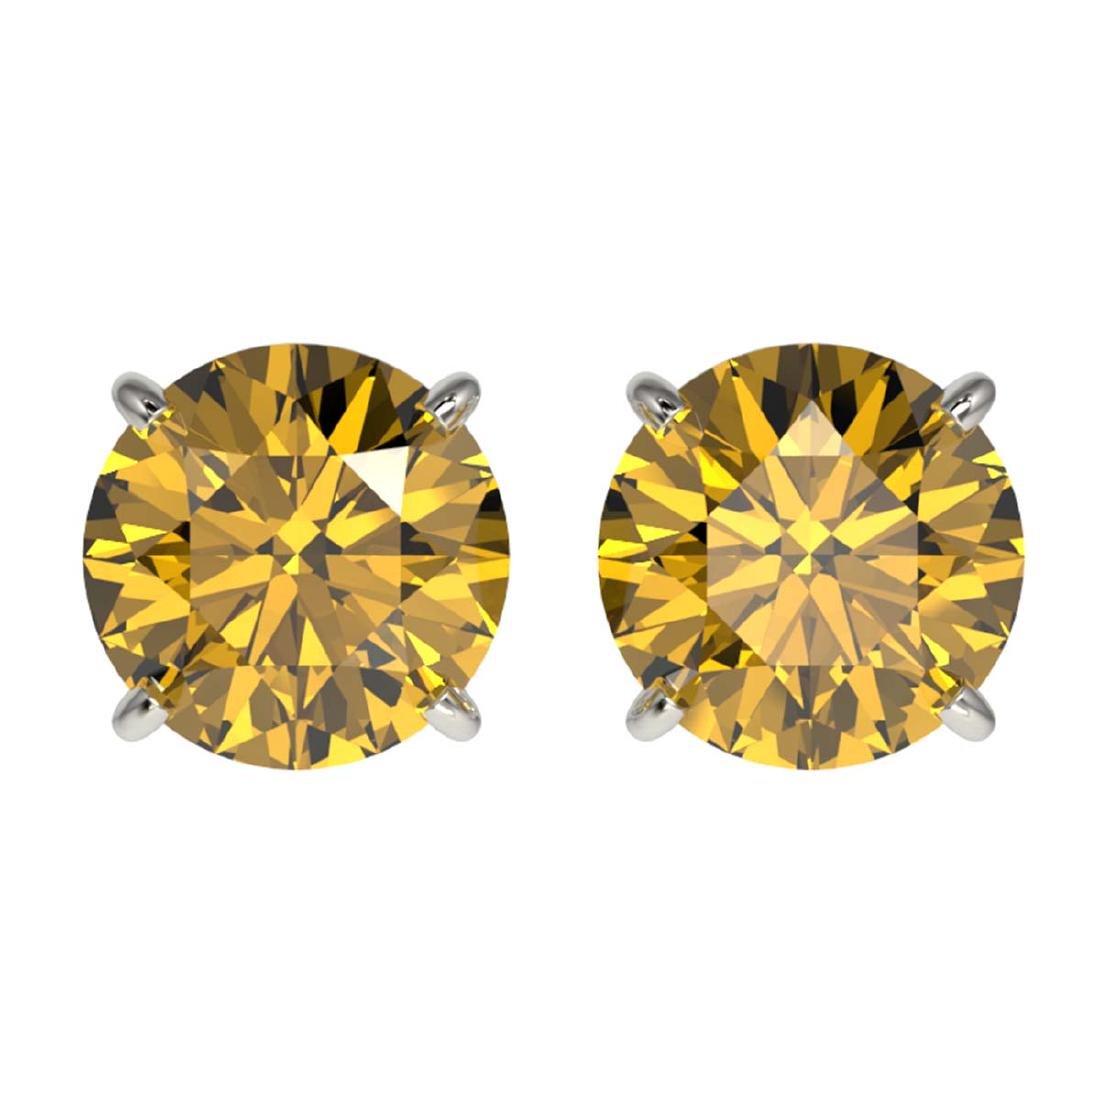 2 ctw Intense Yellow Diamond Stud Earrings 10K White